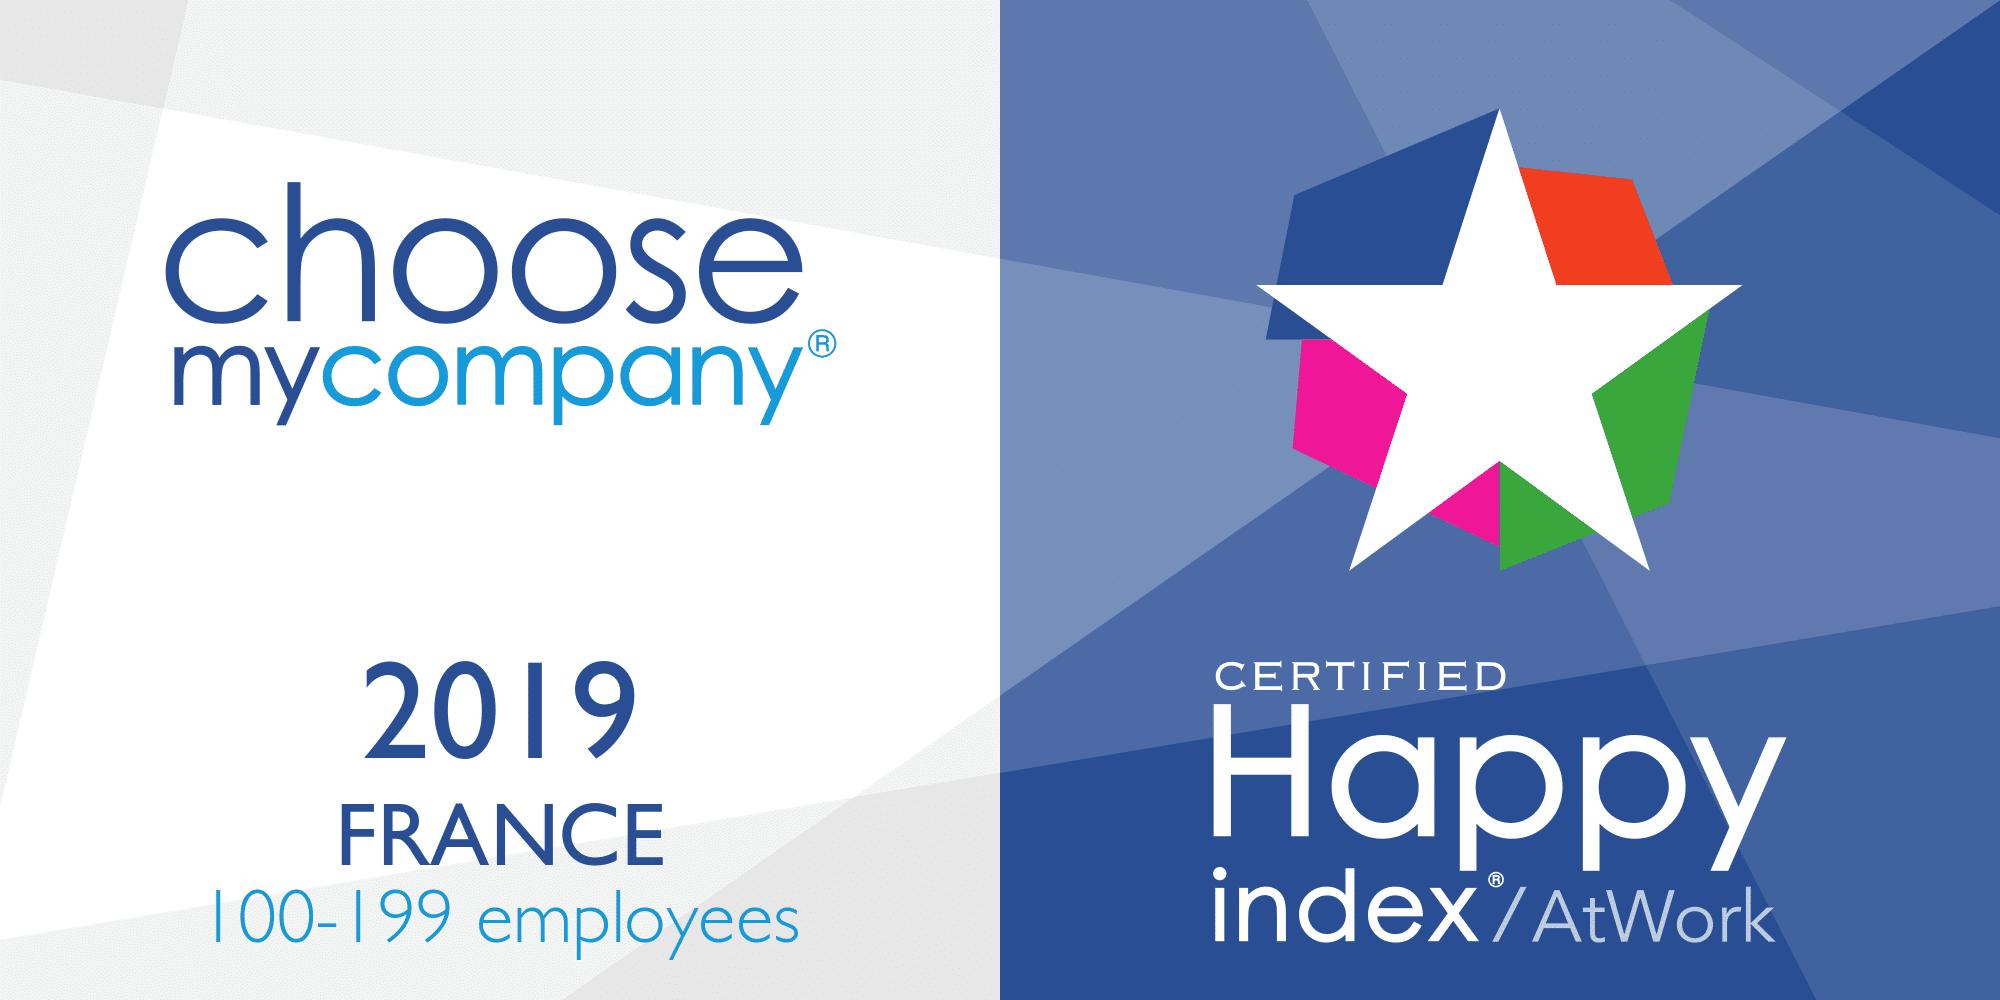 Agence certifiée HappyIndex®/AtWork 2019